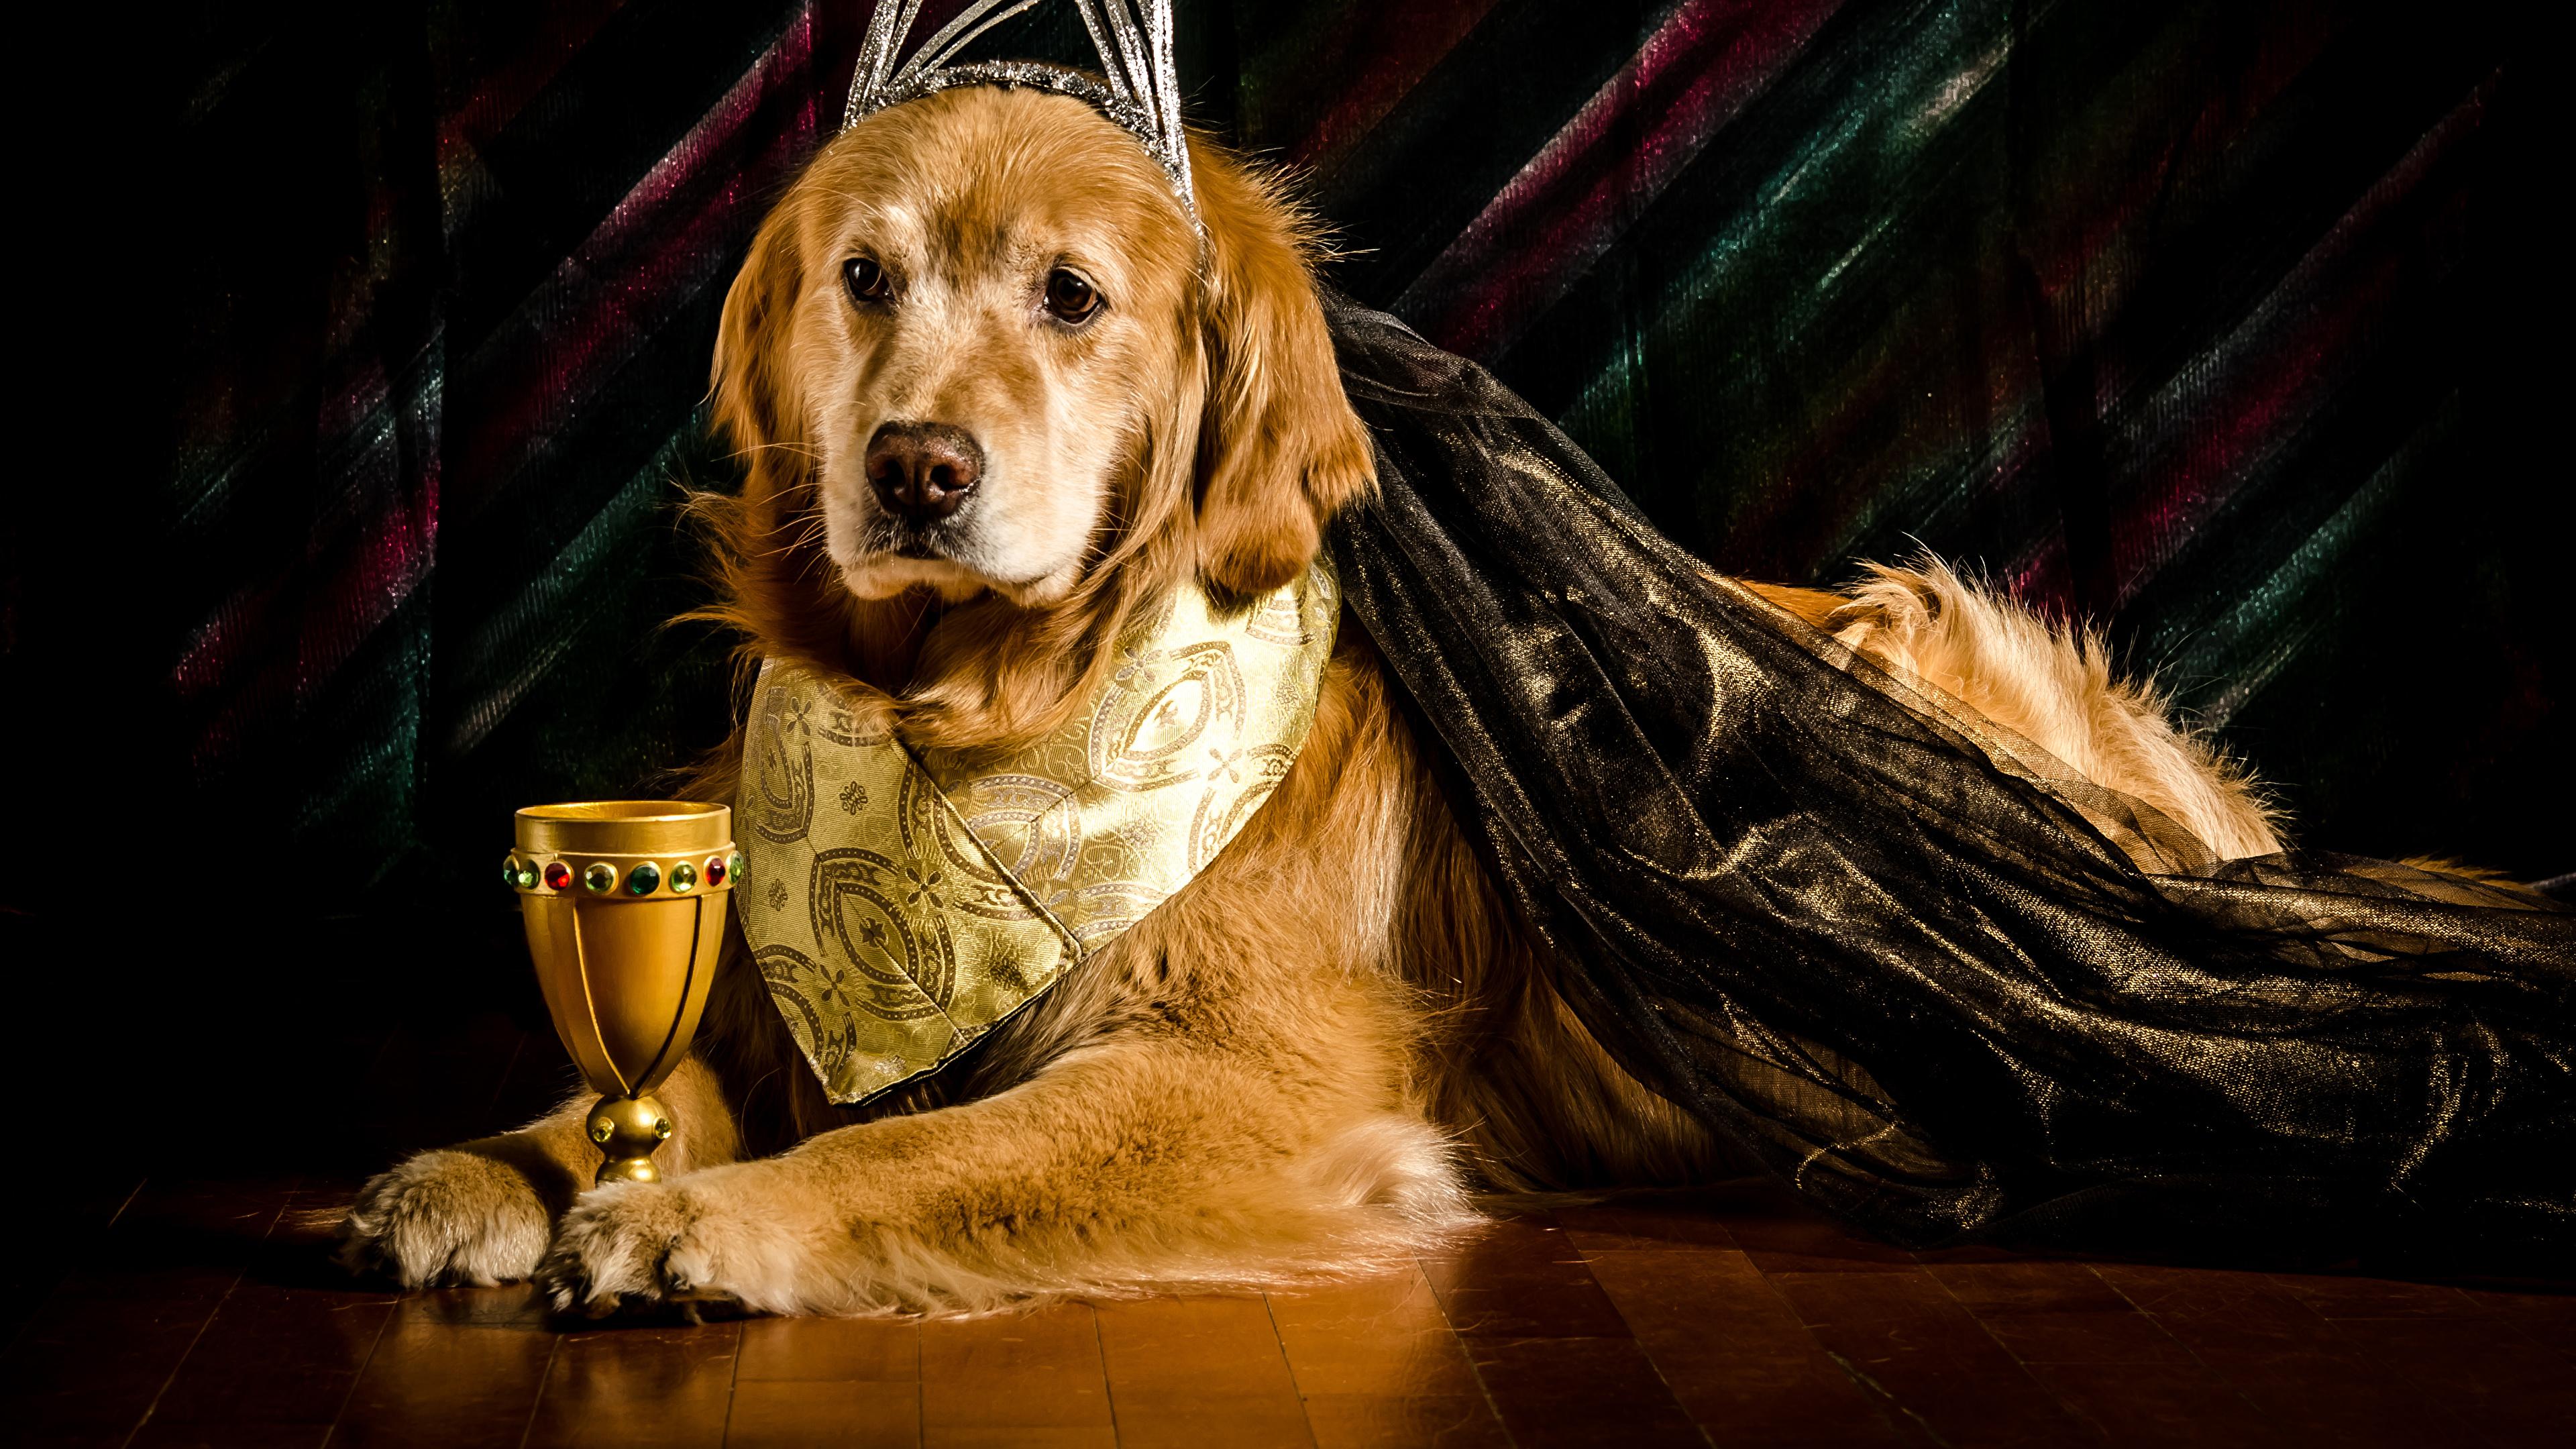 Wallpaper Golden Retriever Dogs Stemware Animals 3840x2160